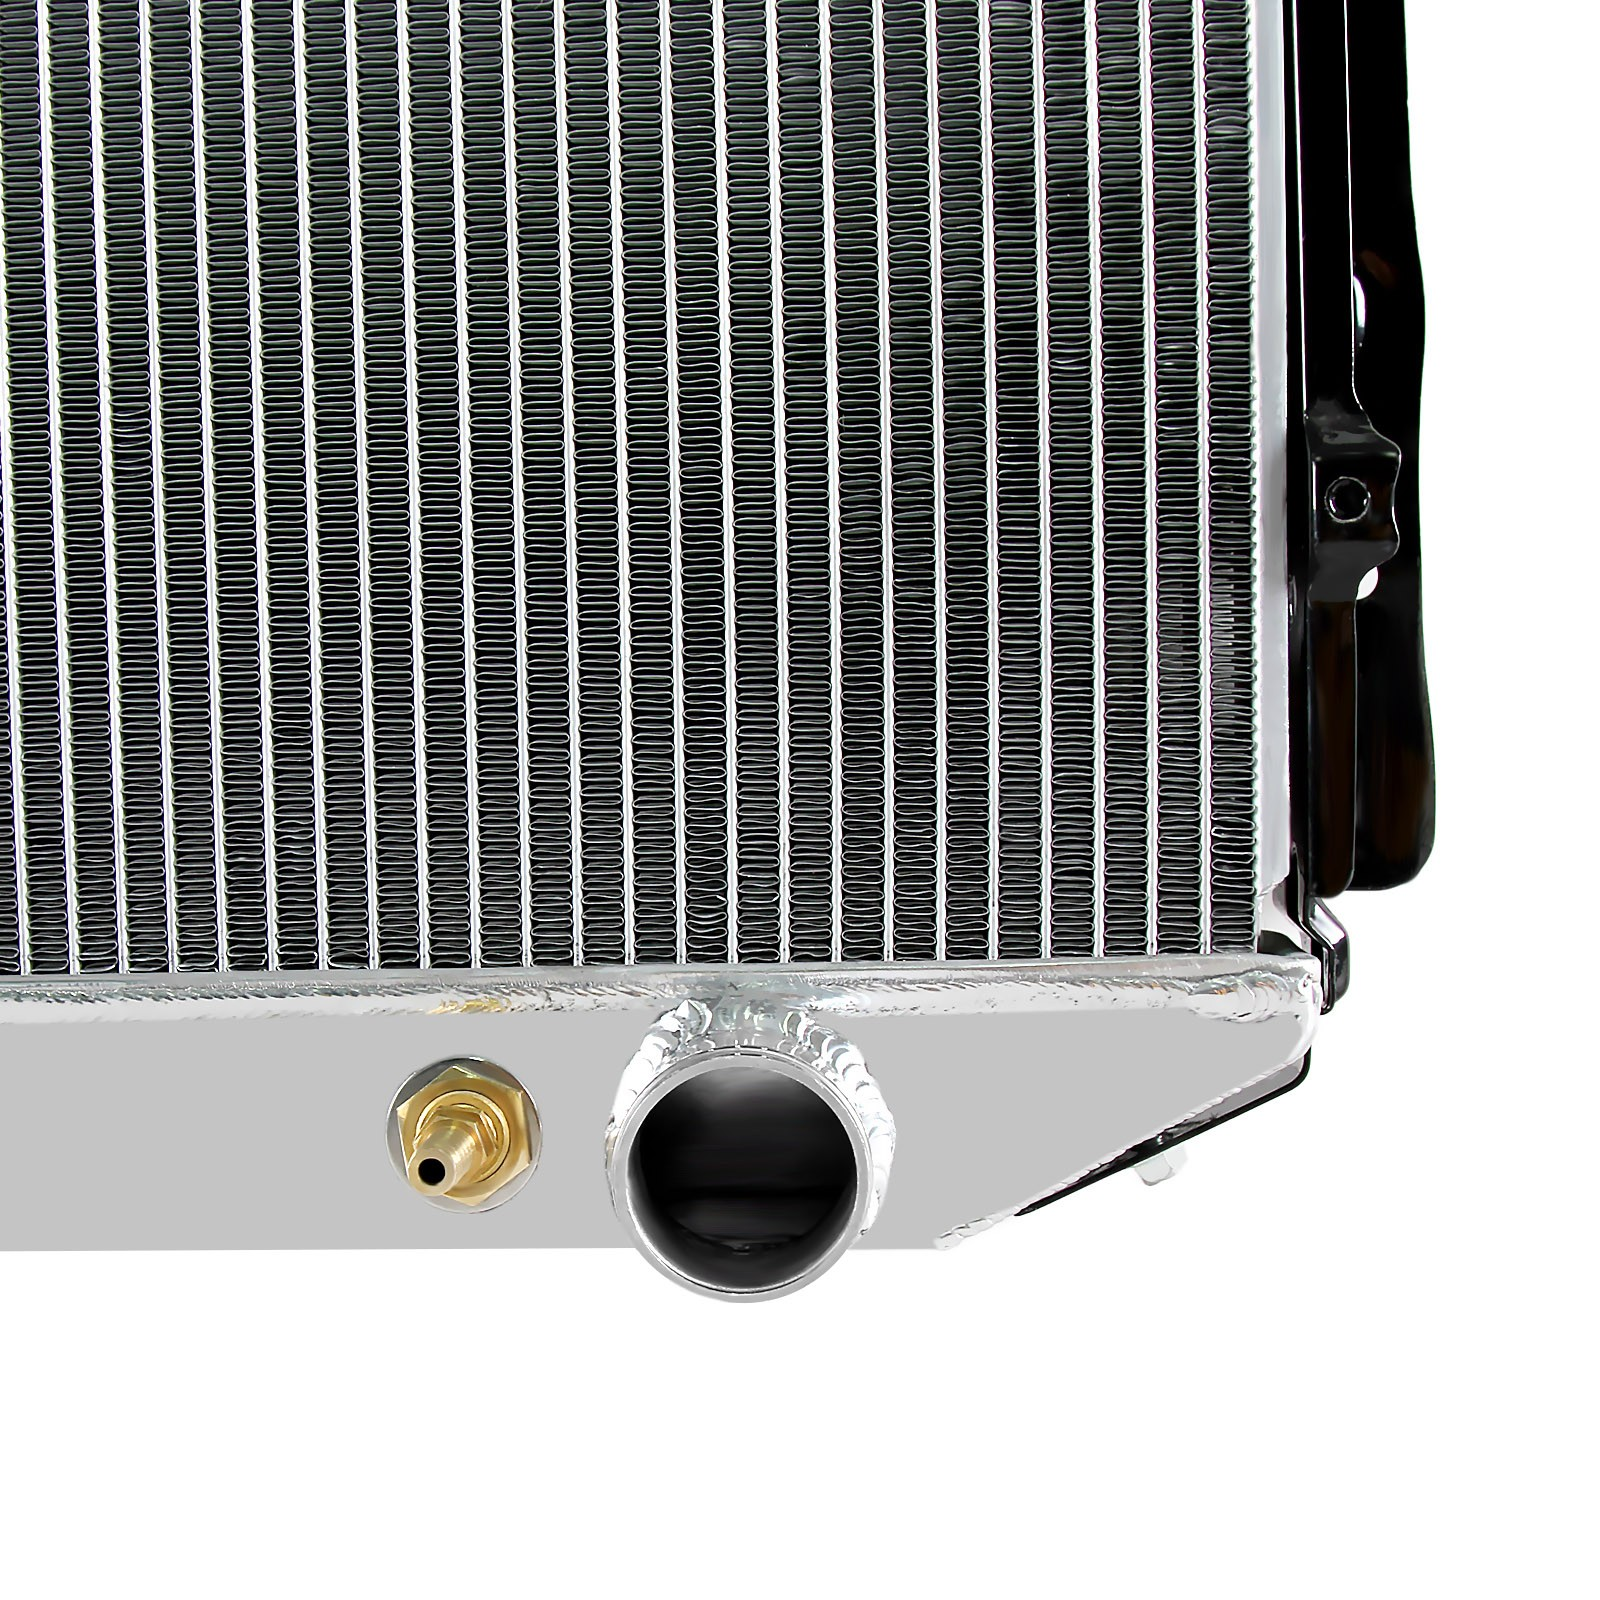 33l 20052007 at Dromedary Brand 2005 dodge ram 1500 radiator supplier